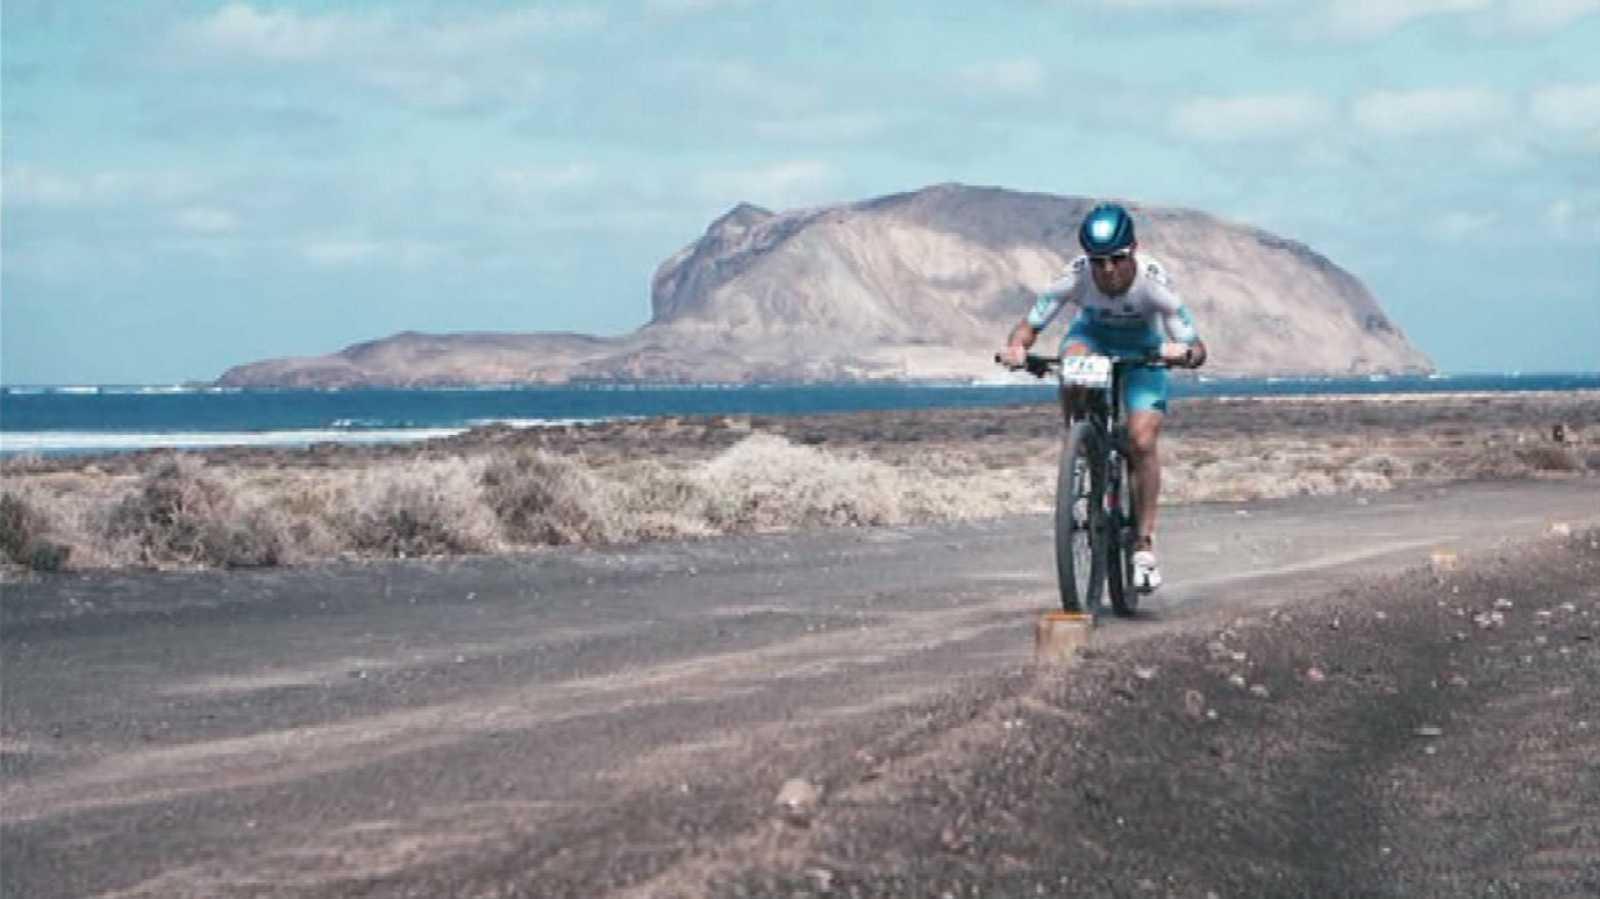 Triatlón Cross y Trail 'Desafío Octava Isla'